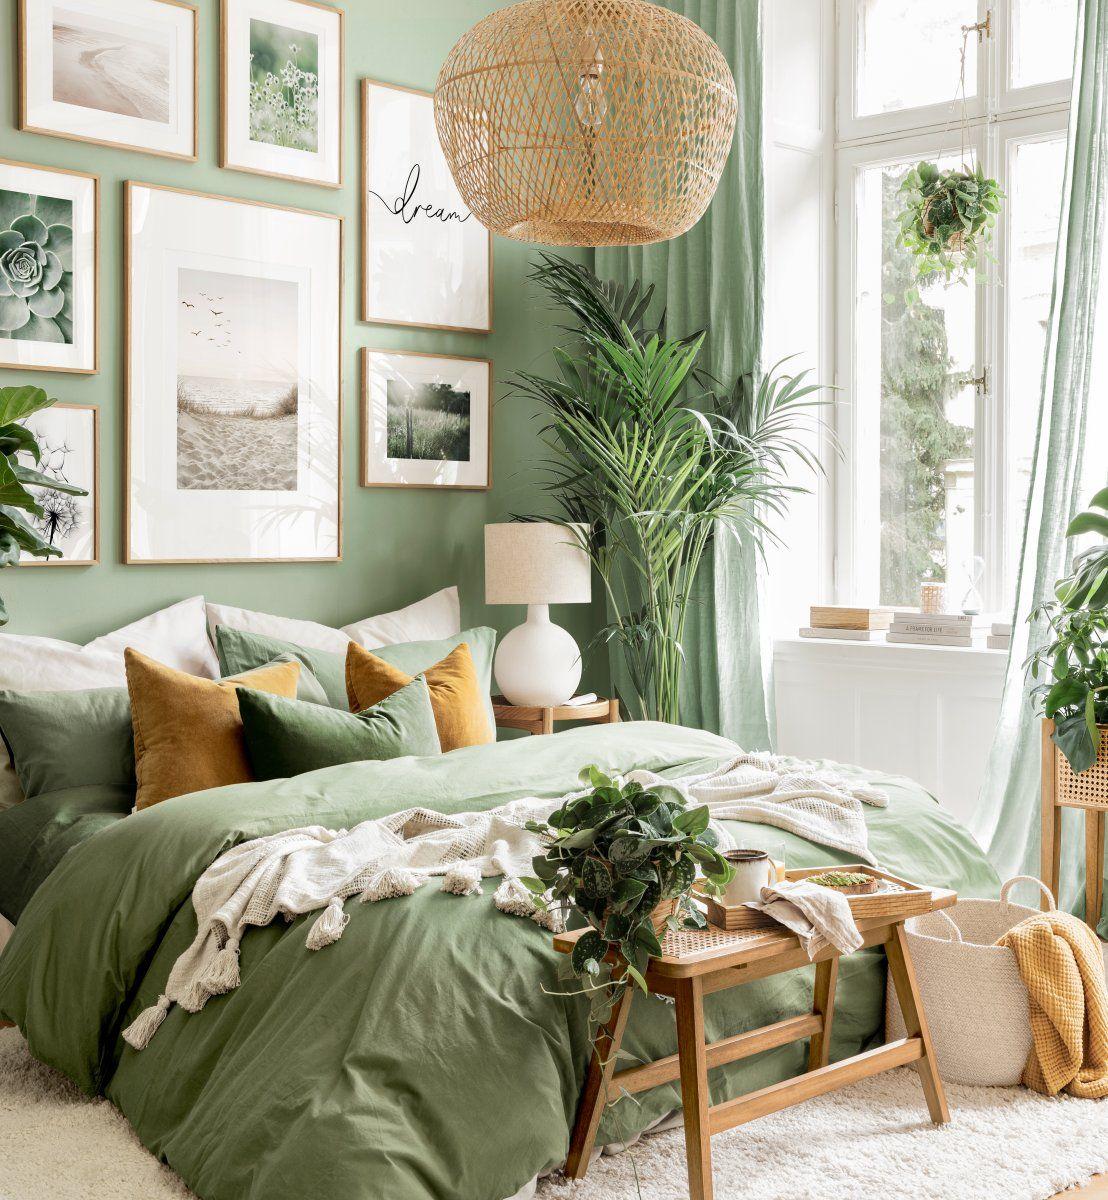 Sage Green Bedroom Room Inspiration Bedroom Room Design Bedroom Green nature bedroom ideas